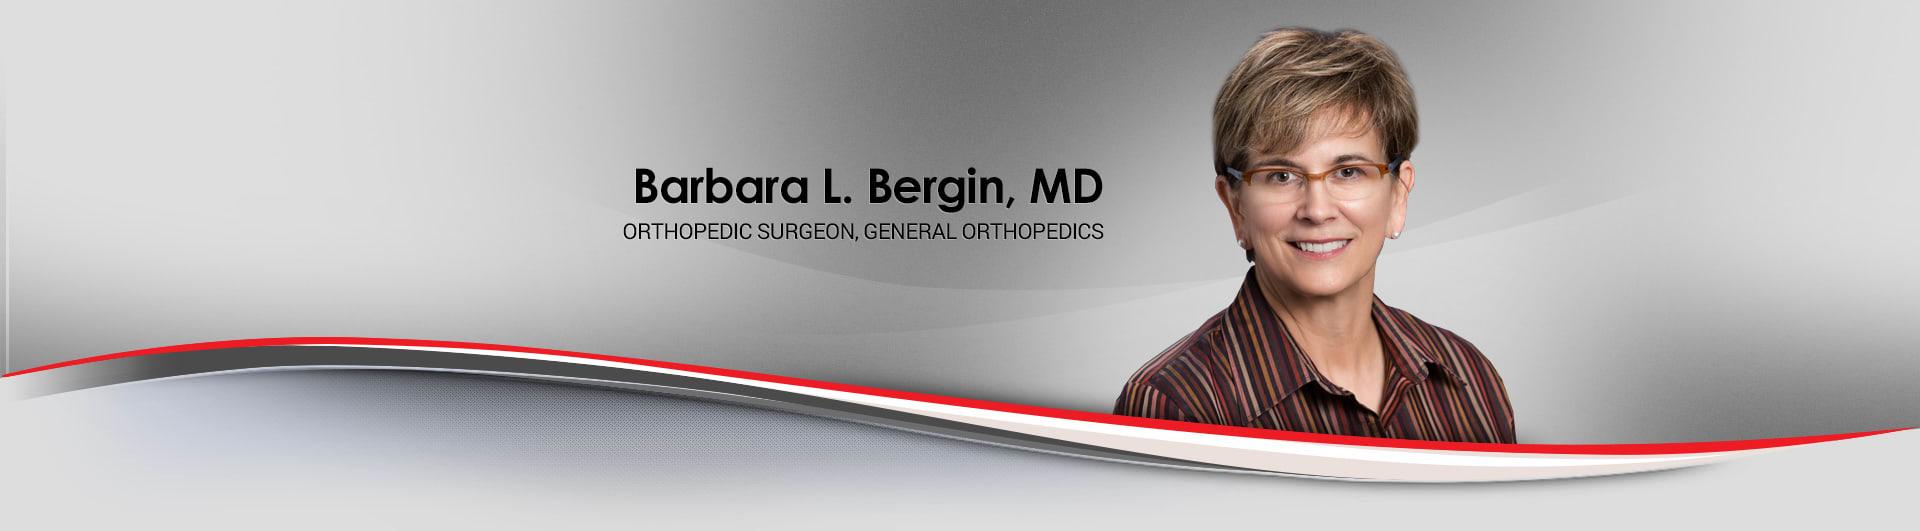 Barbara L Bergin-Nader, MD Orthopaedic Surgery